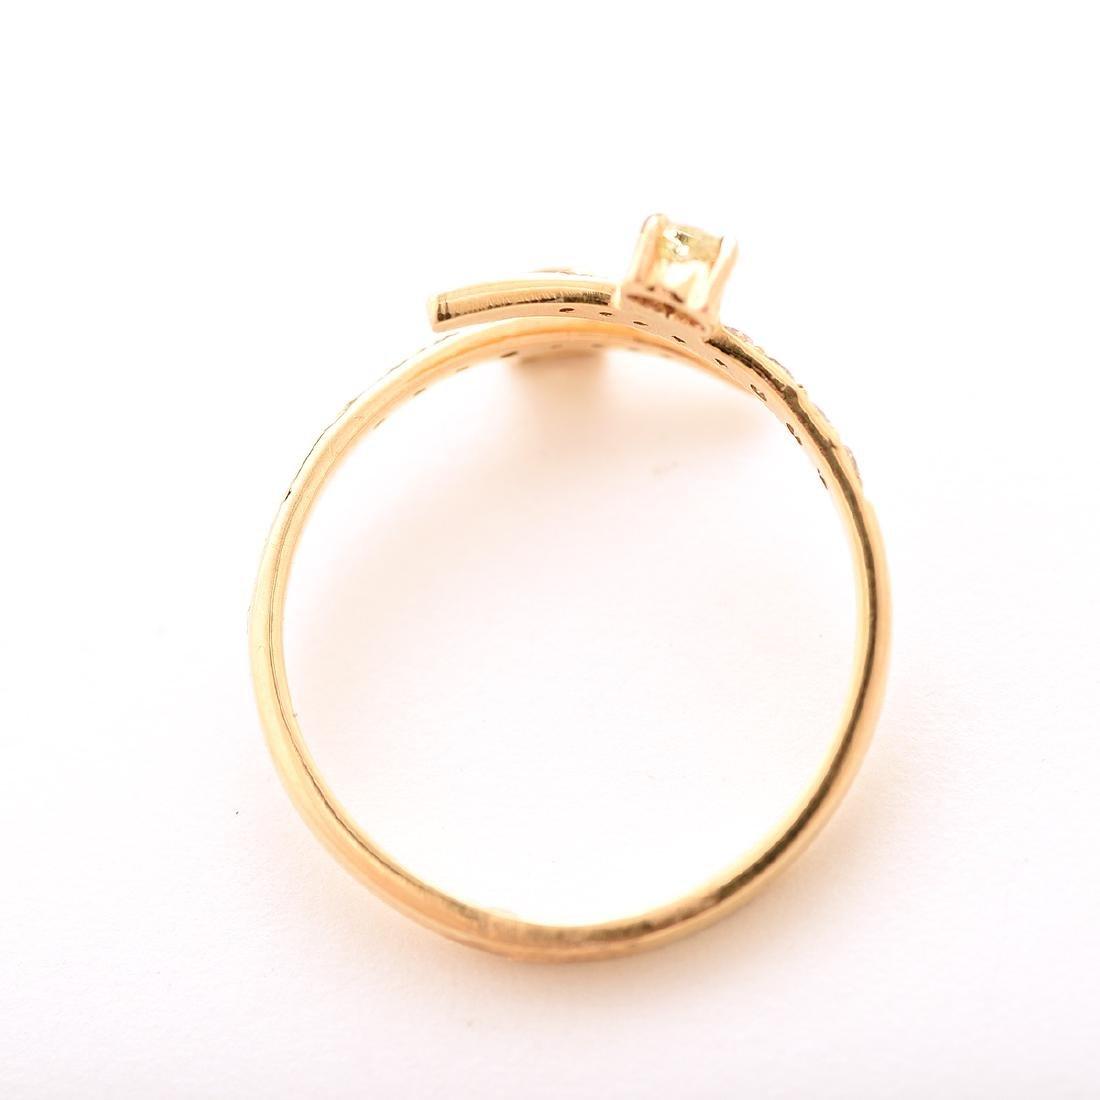 Diamond, 18k Yellow Gold Bypass Ring. - 3